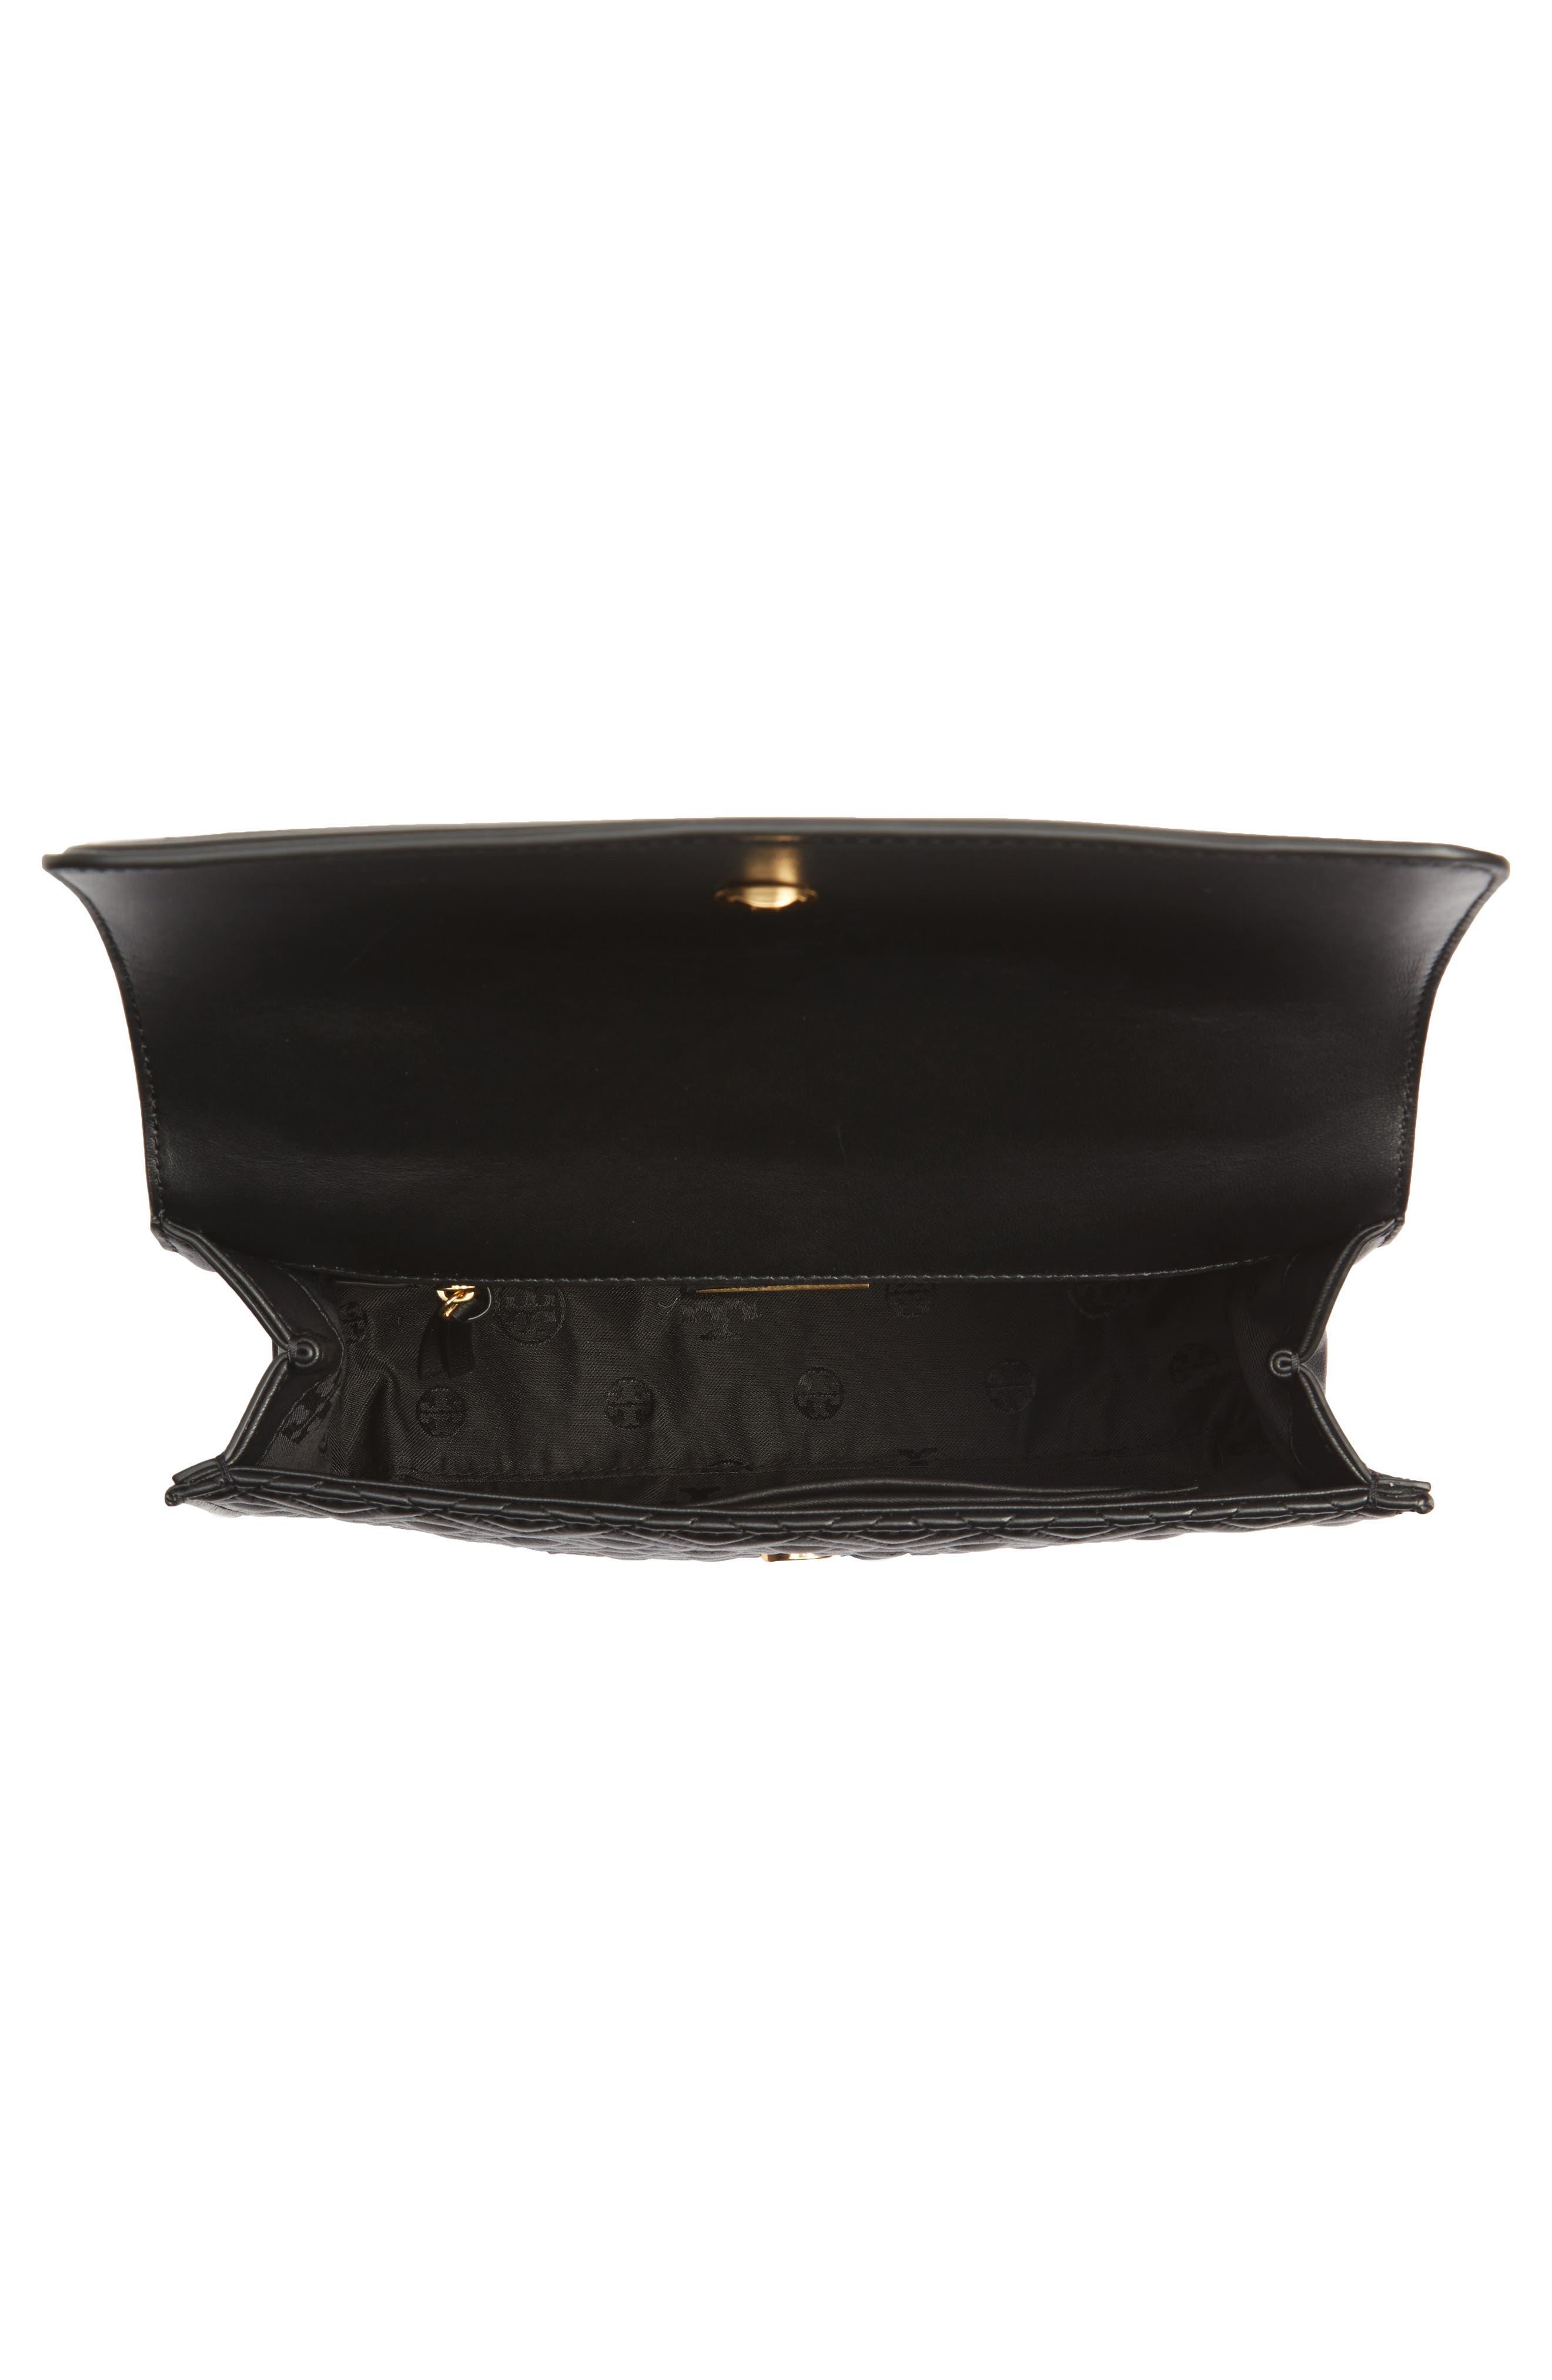 TORY BURCH, Fleming Leather Convertible Shoulder Bag, Alternate thumbnail 5, color, BLACK